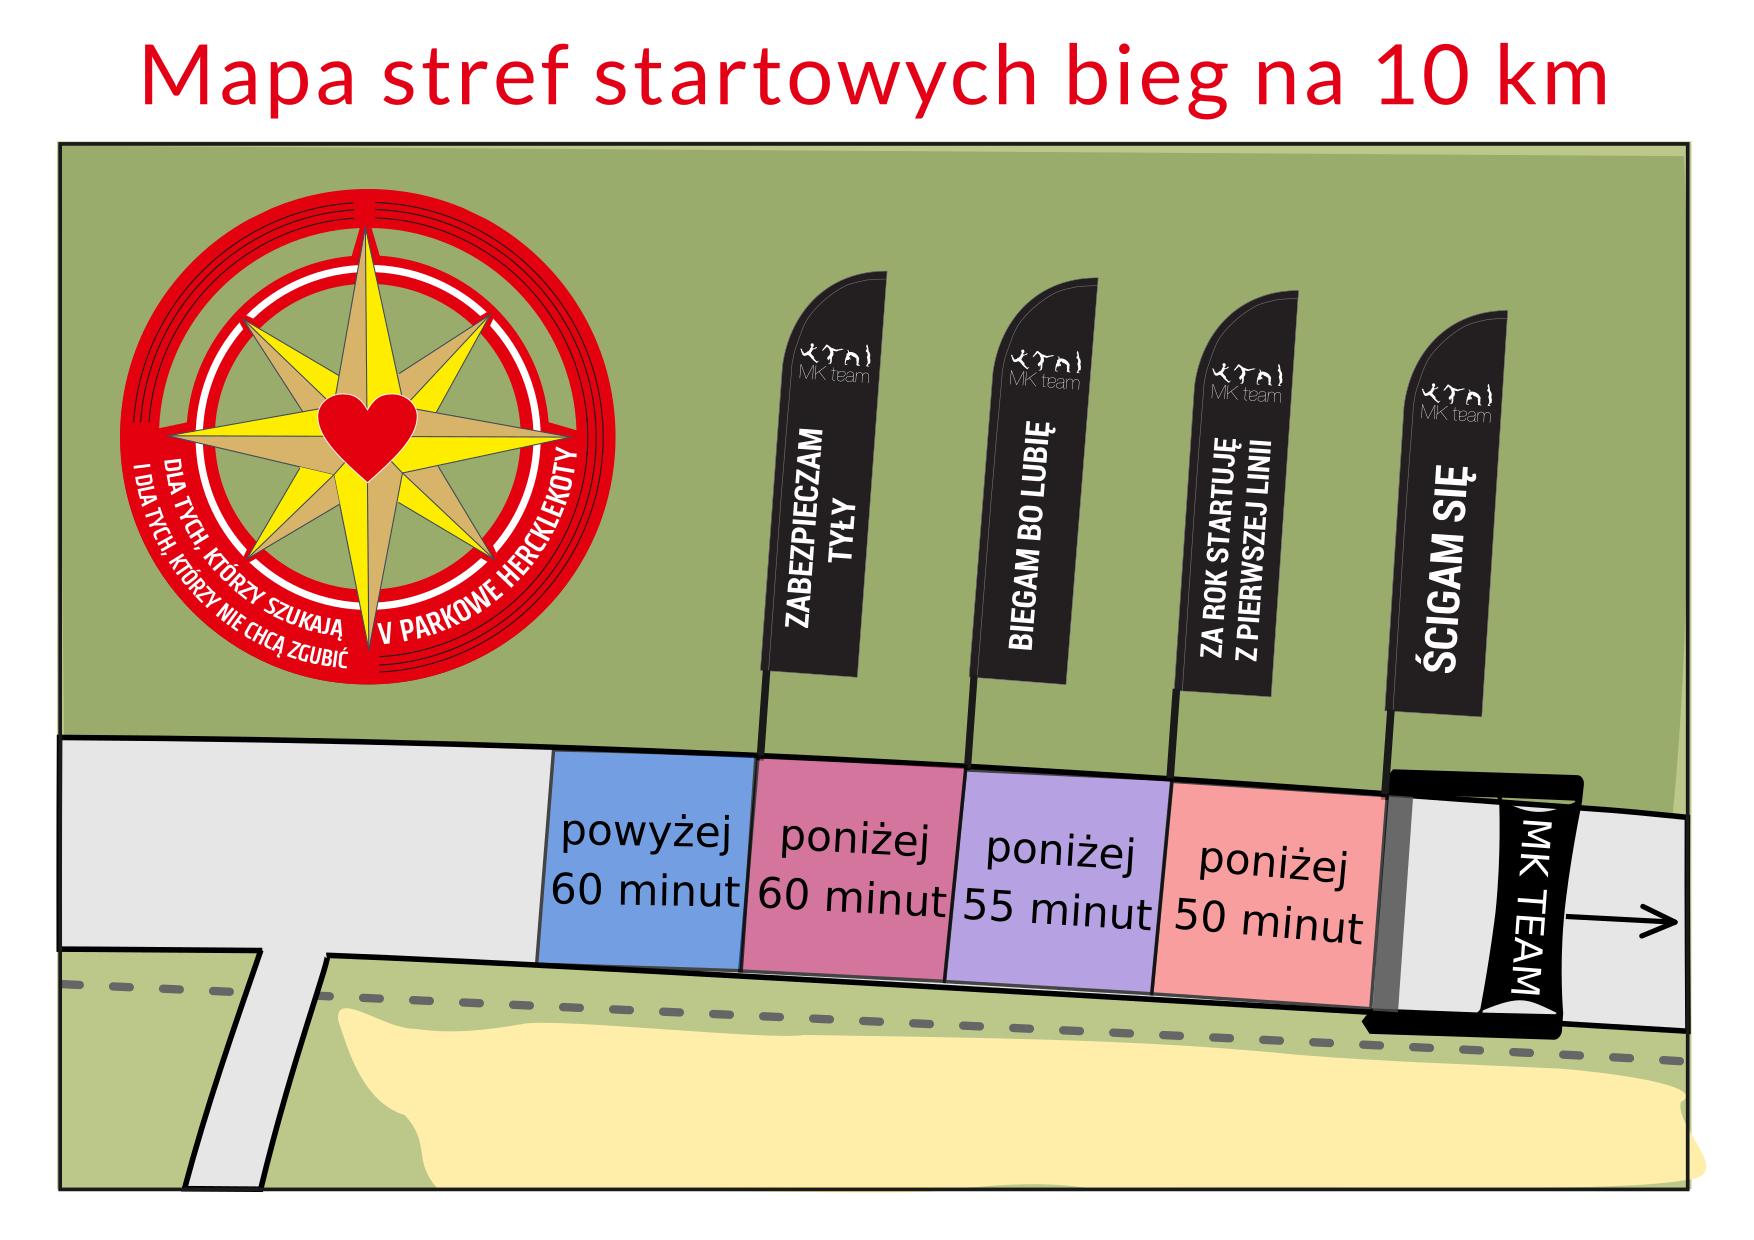 Mapa startu biegu na 10 km